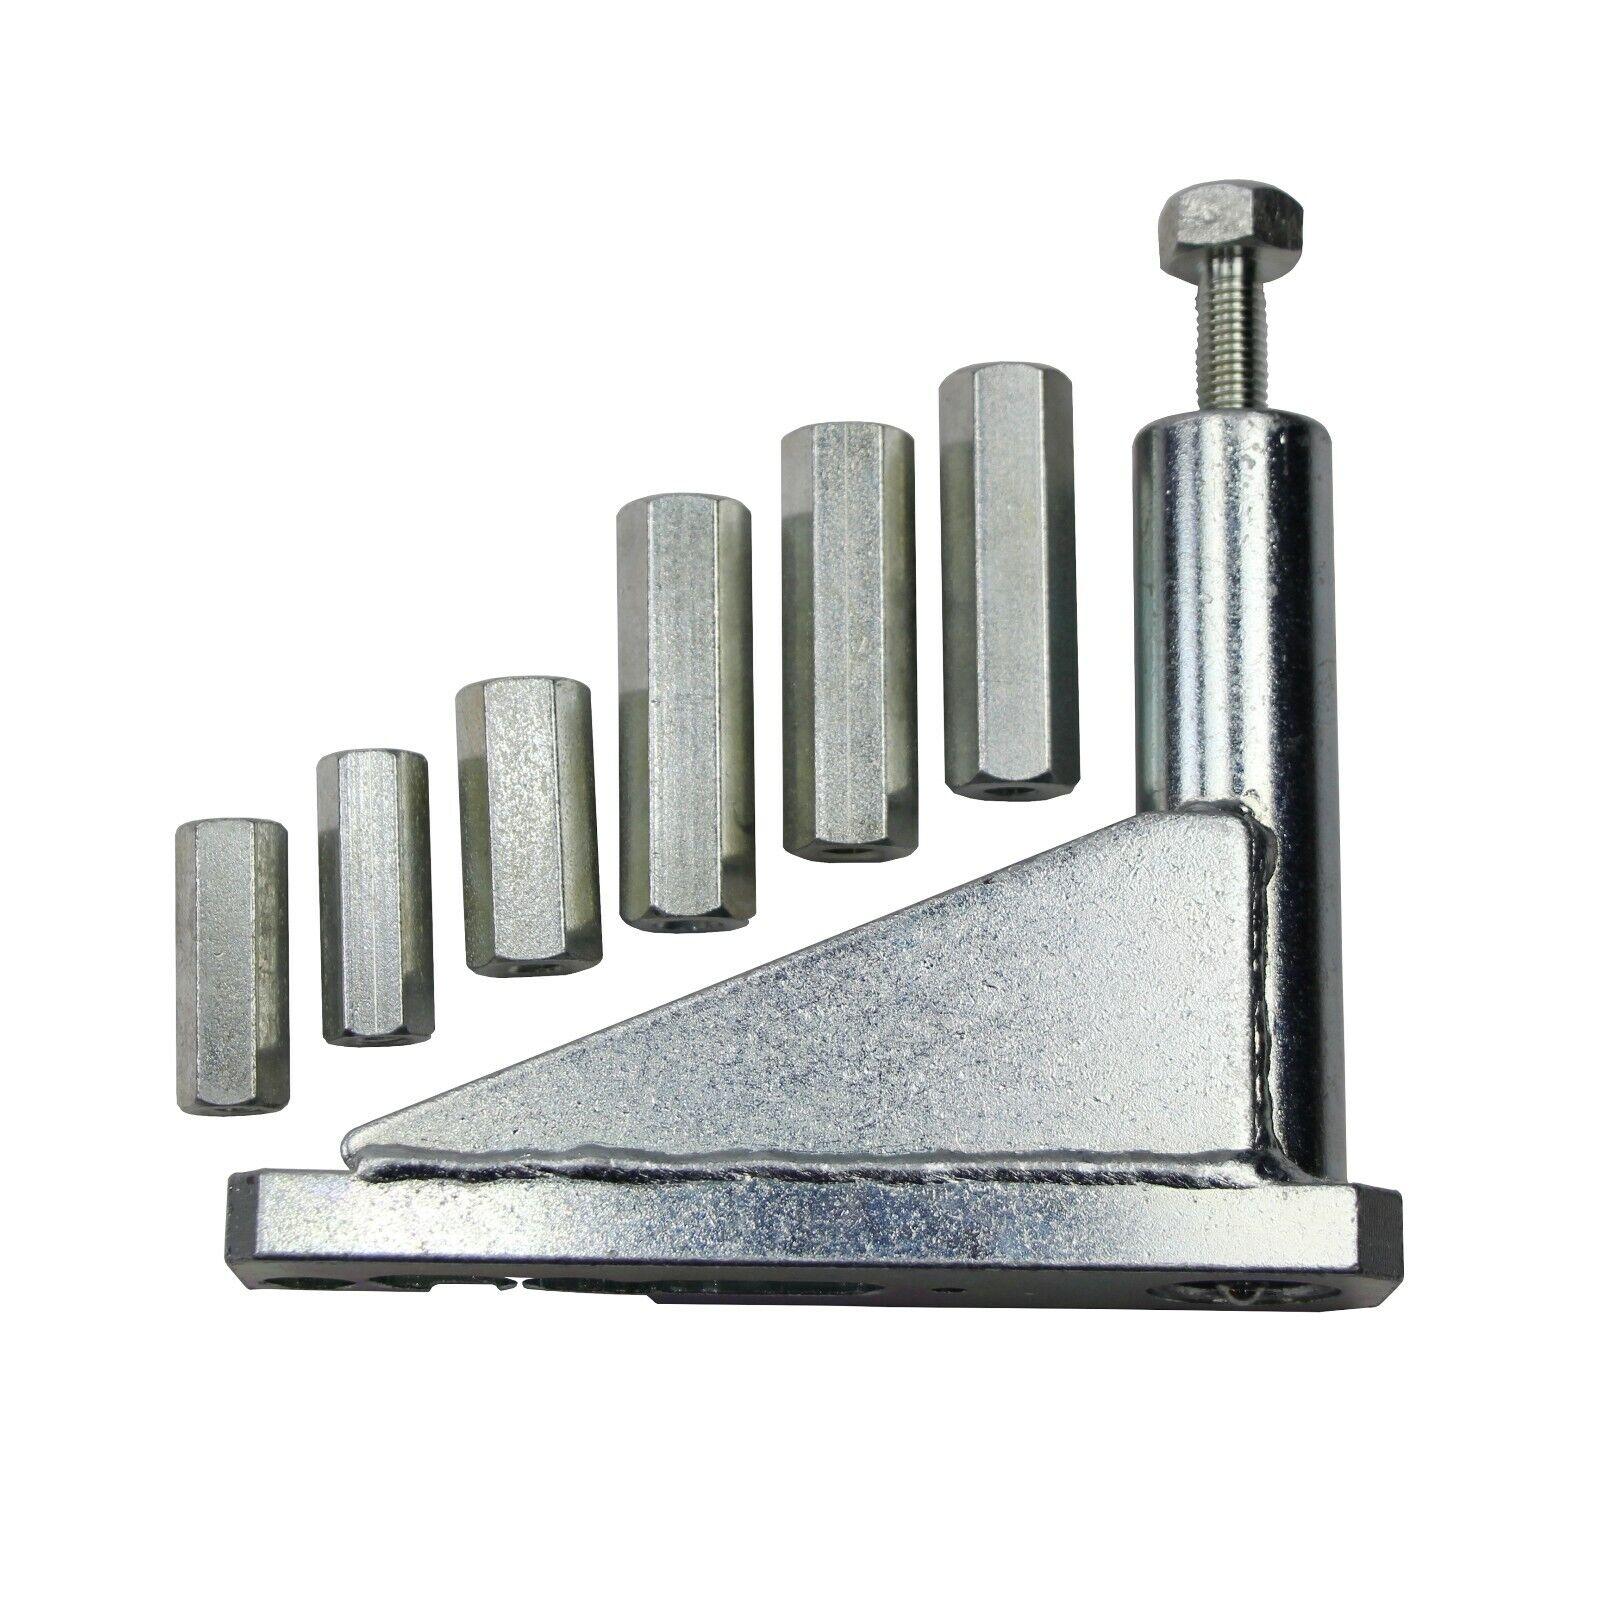 Holzfforma Crank Splitter Mounting Tool For Stihl 065 066 MS260 MS360 MS361